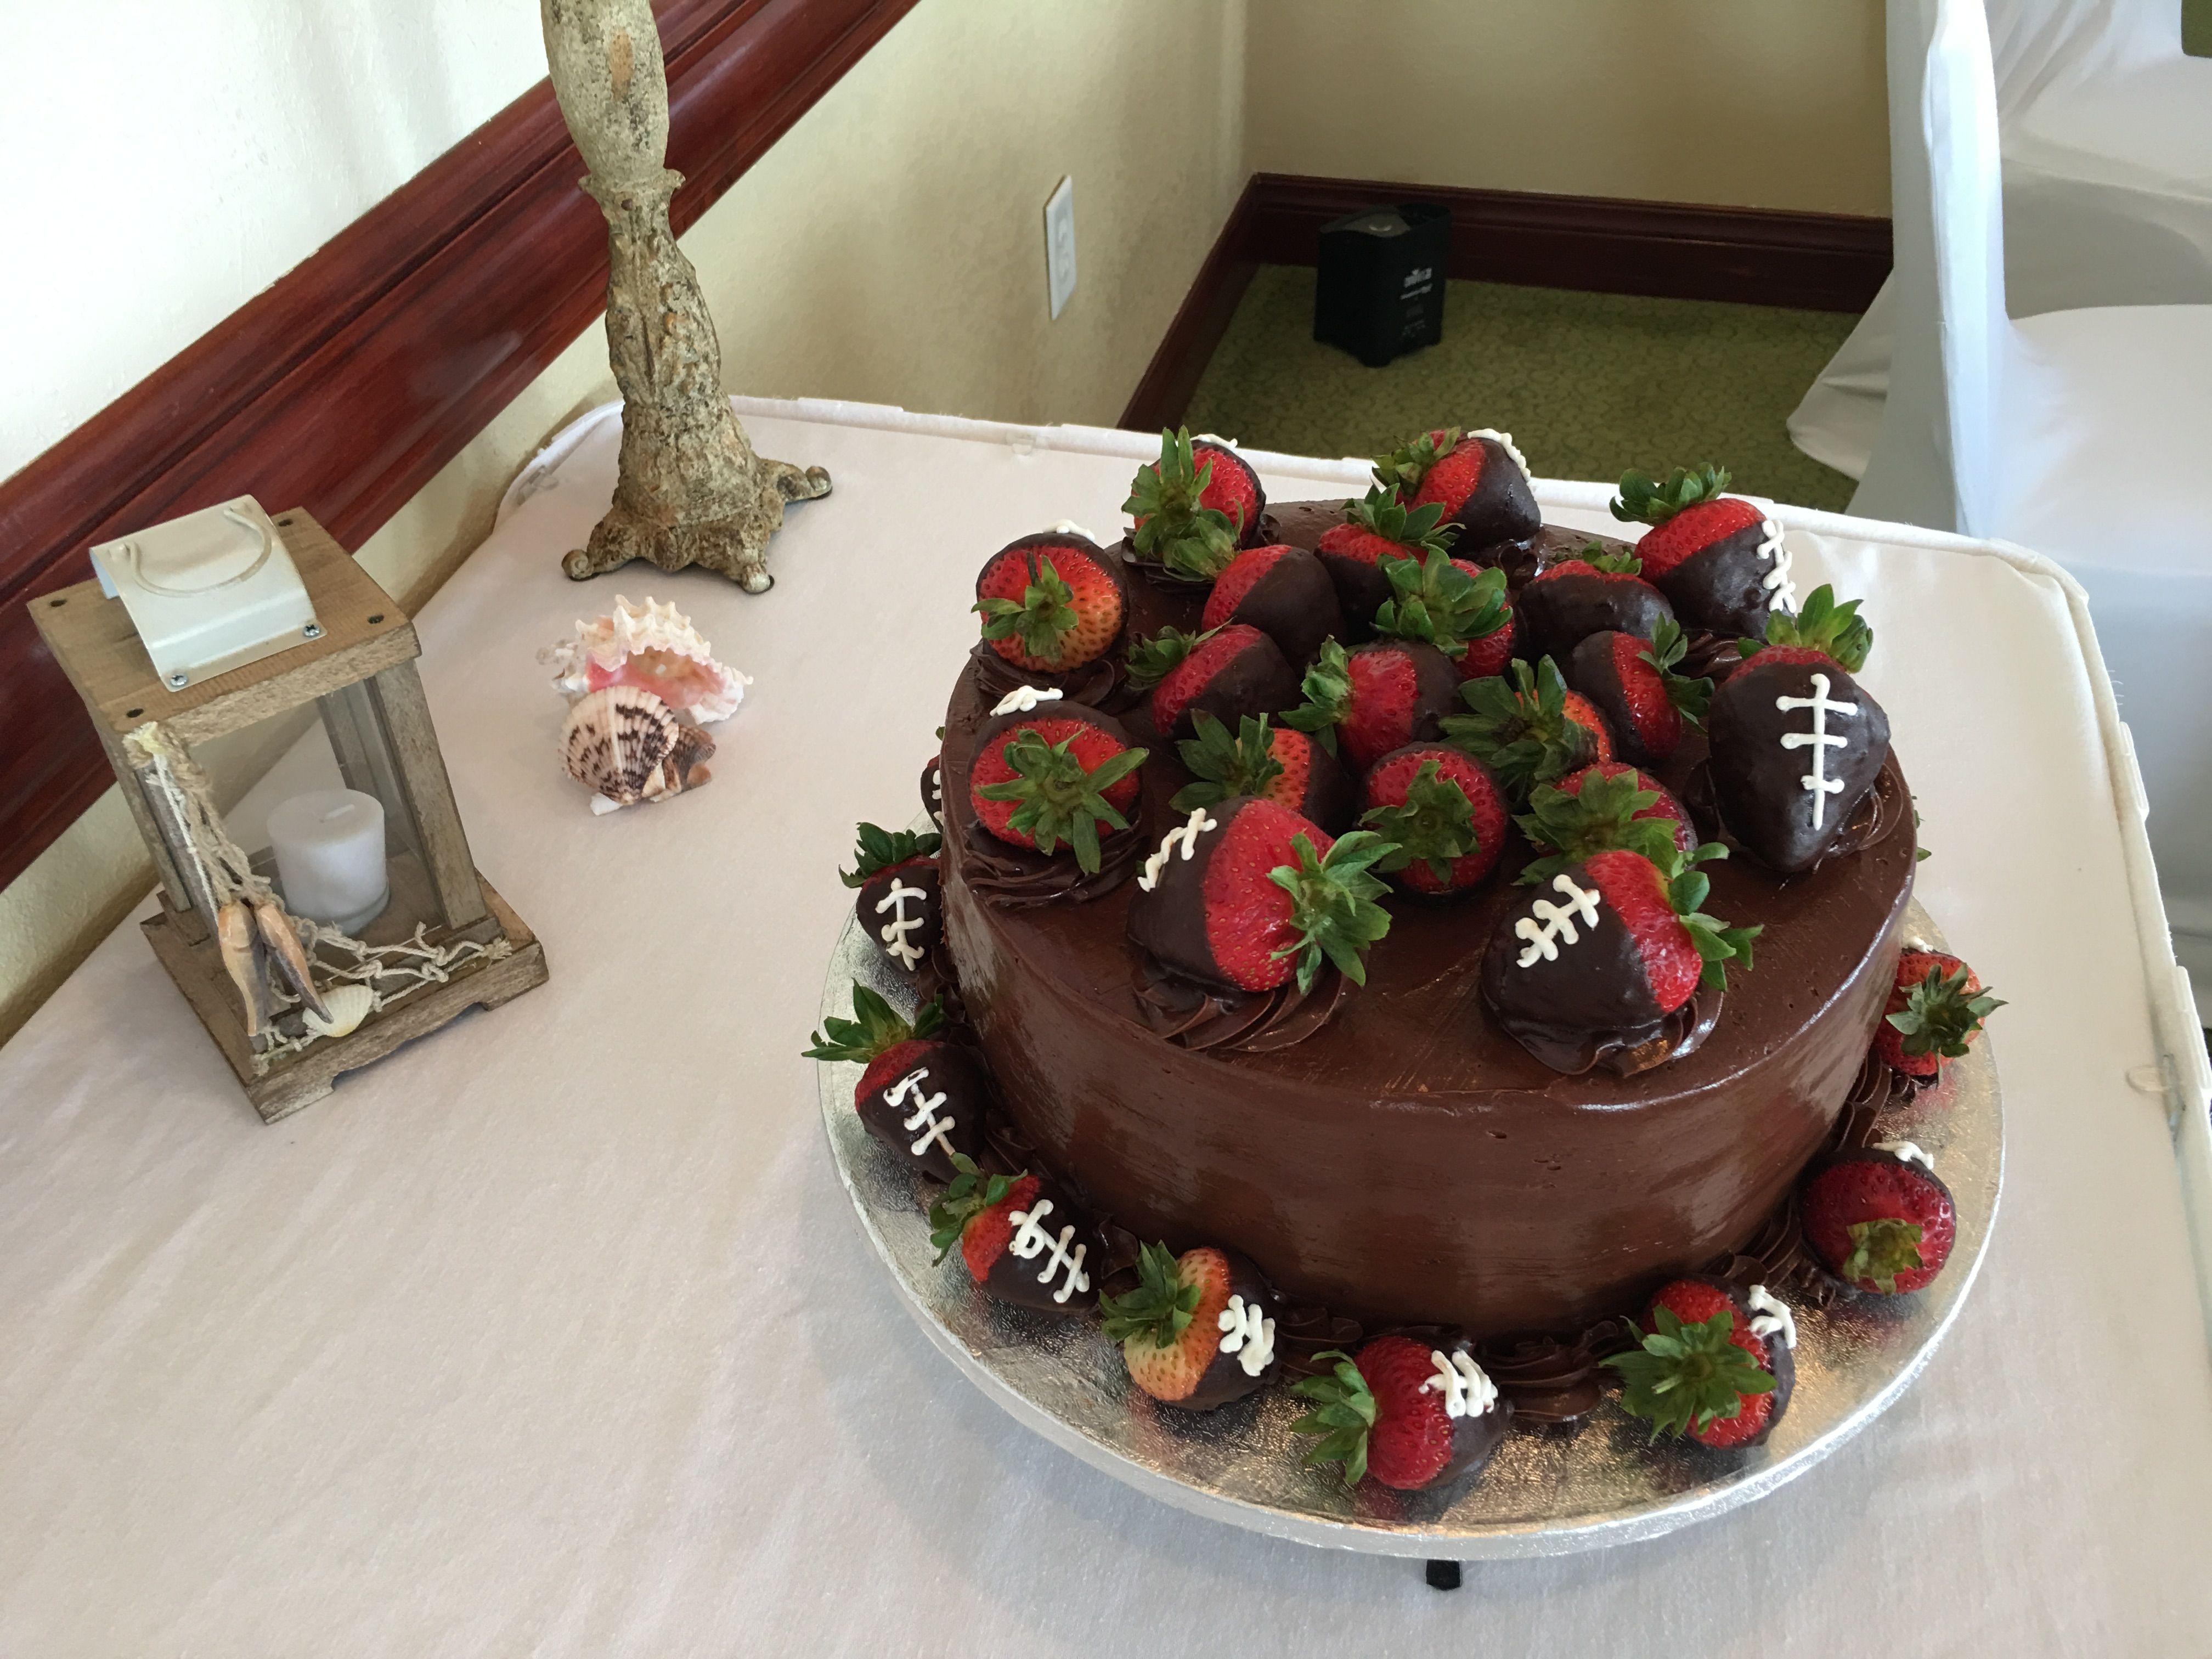 Grooms cake publix 62017 cake grooms cake desserts